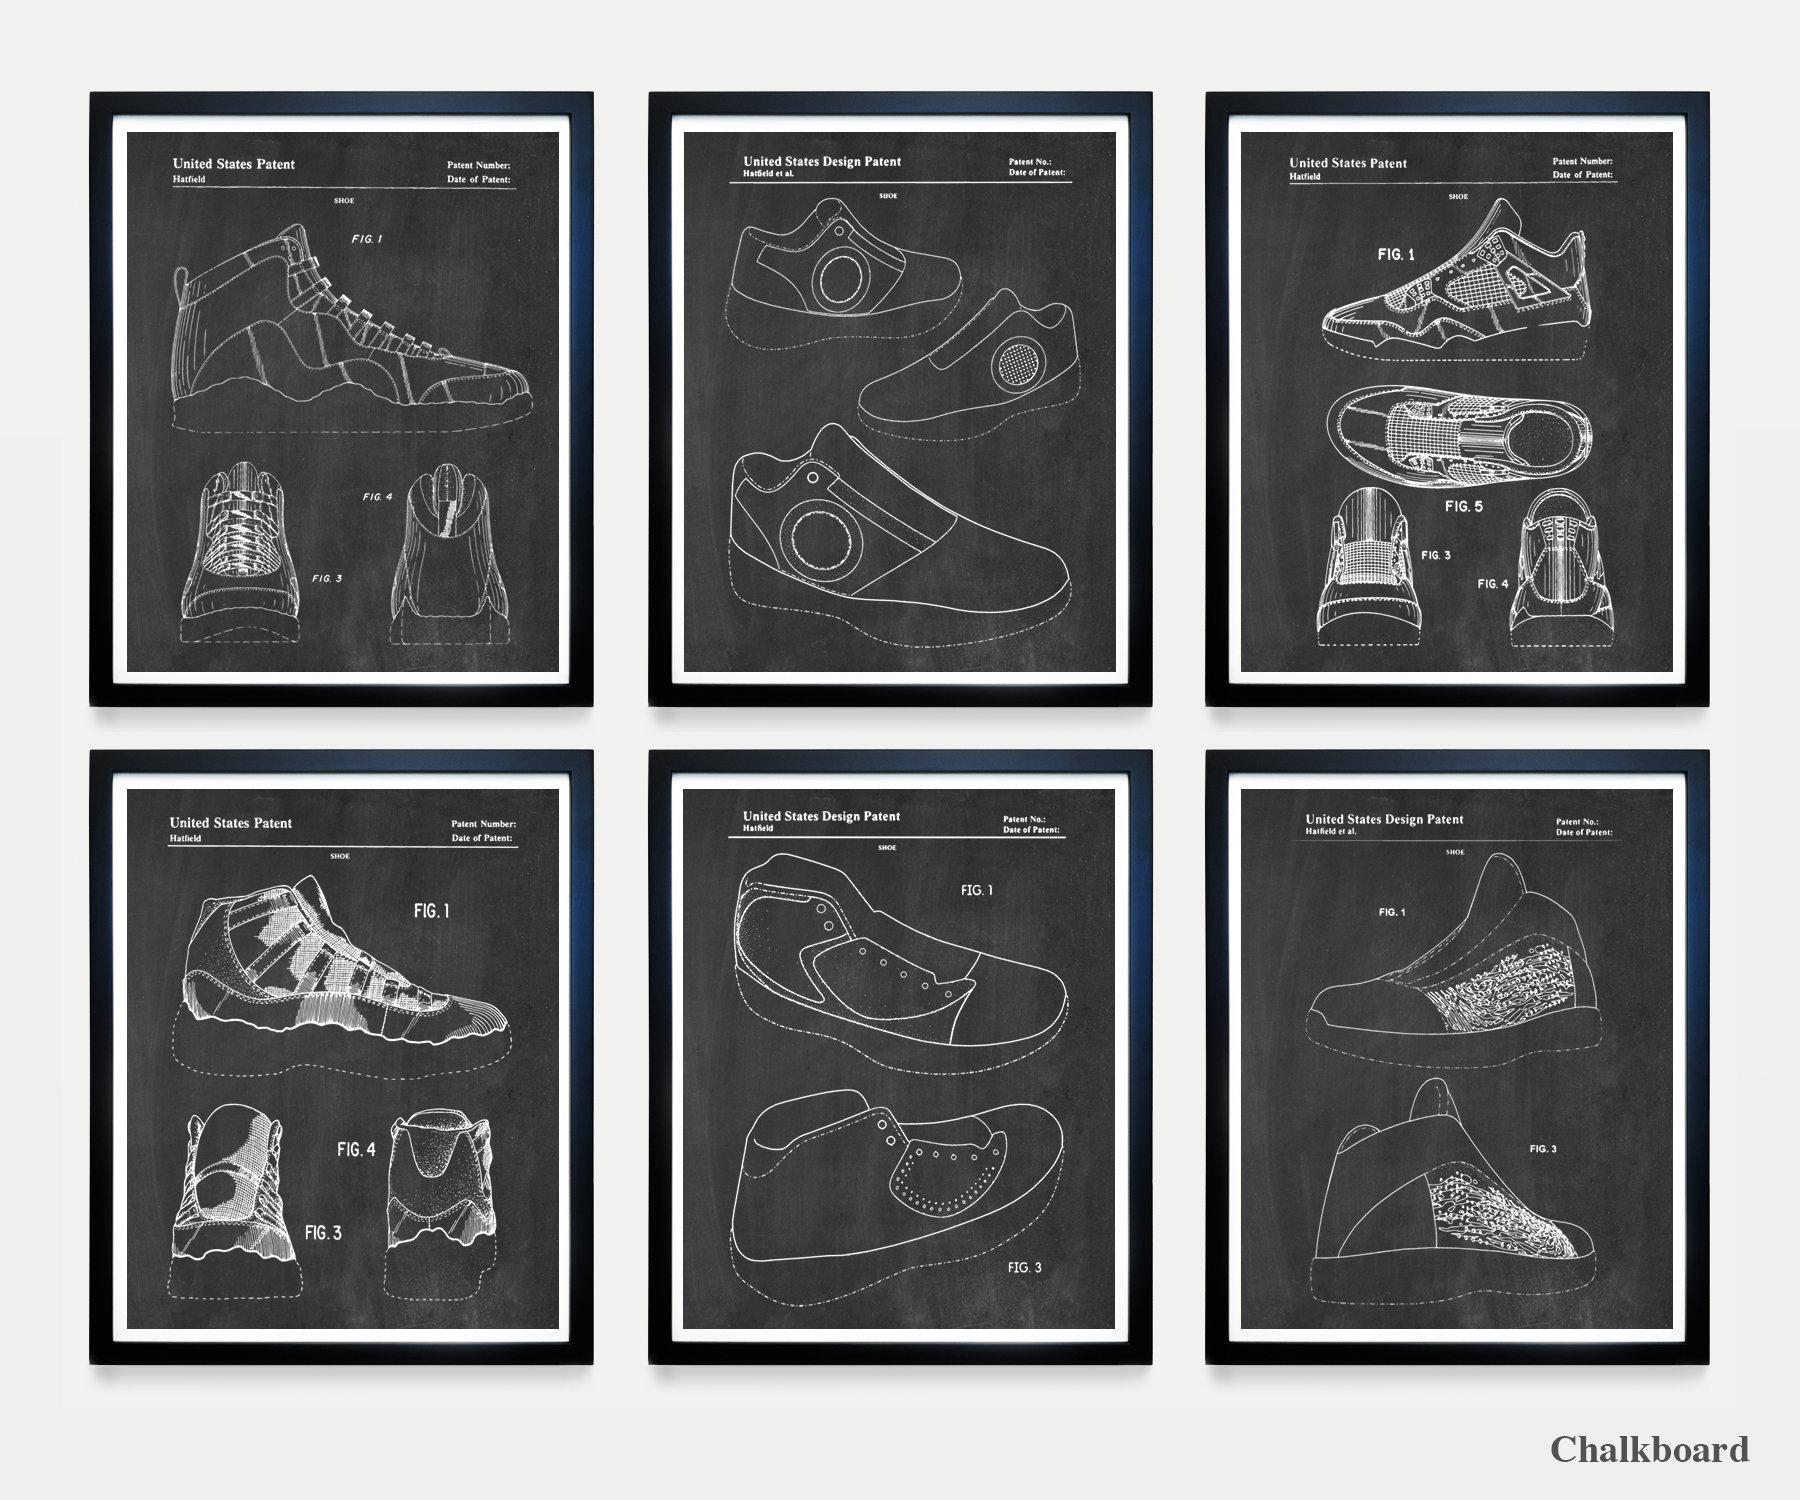 M Nike Mme Chaussures Jordan Brevets Art Air 6qSvz6R